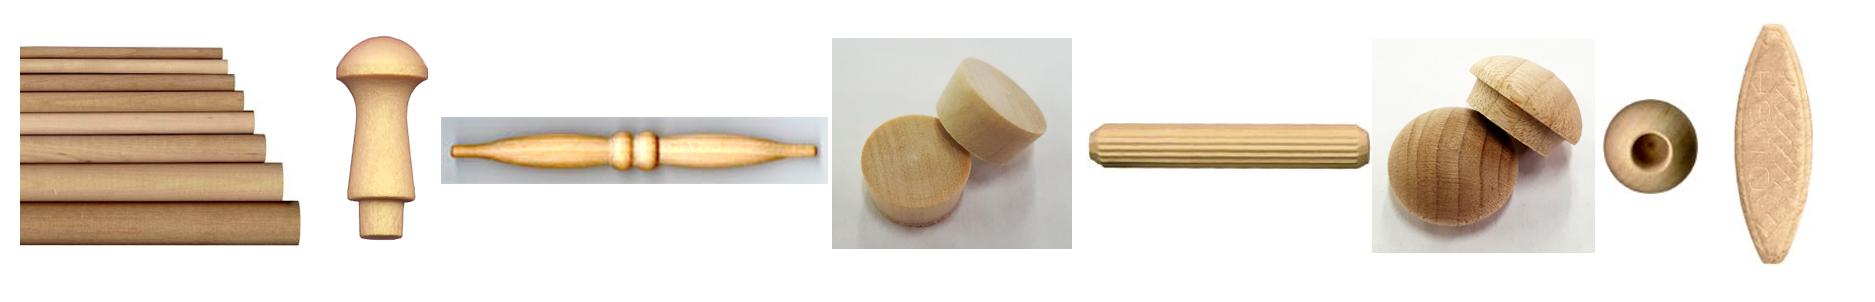 wood crafts wood parts